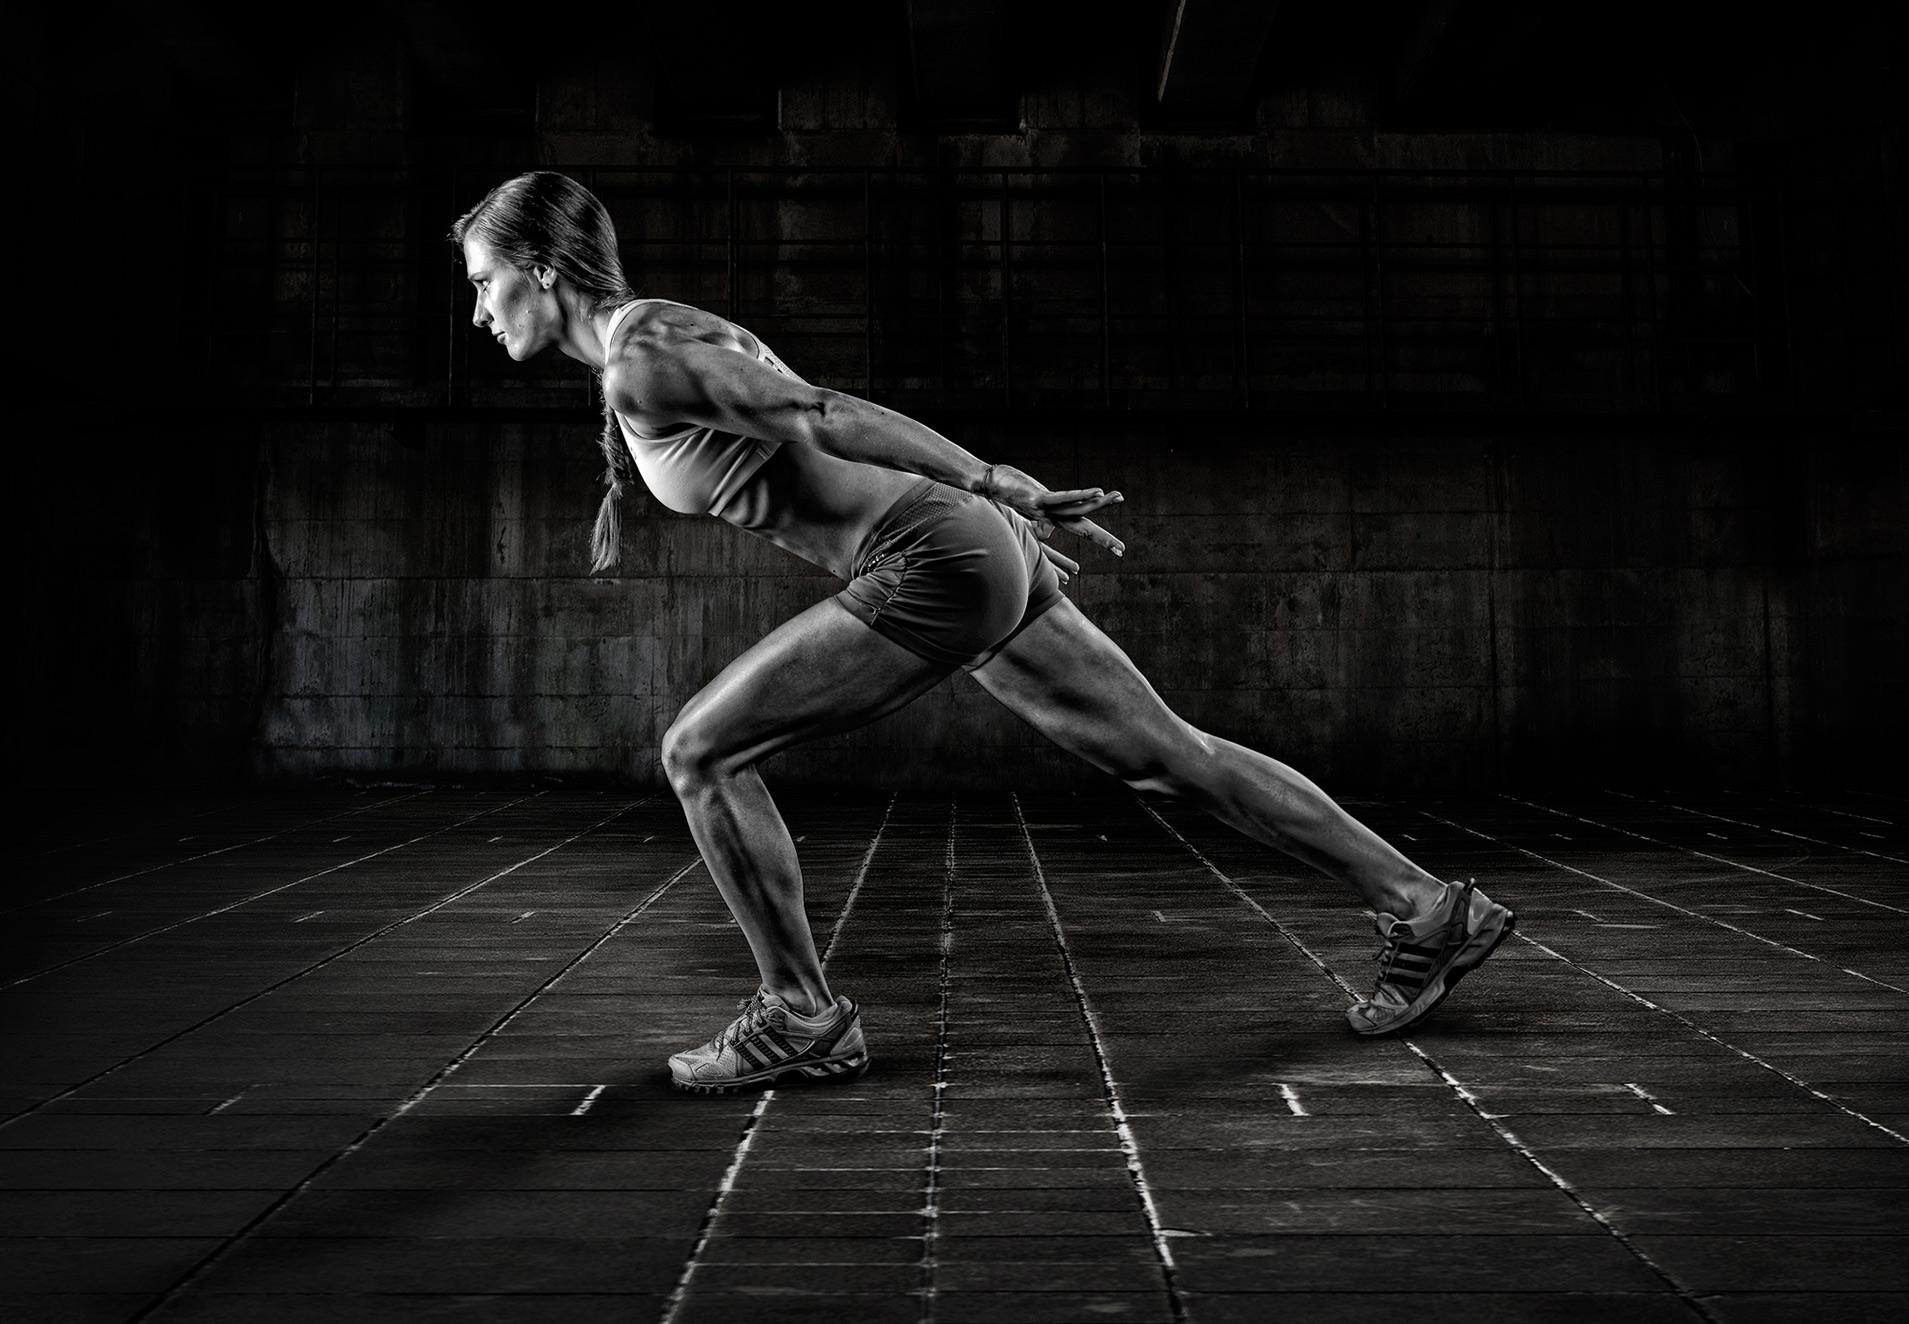 leilani-fitness-photography-gritty-black-and-white-brandon-barnard-professional-photographer.jpg